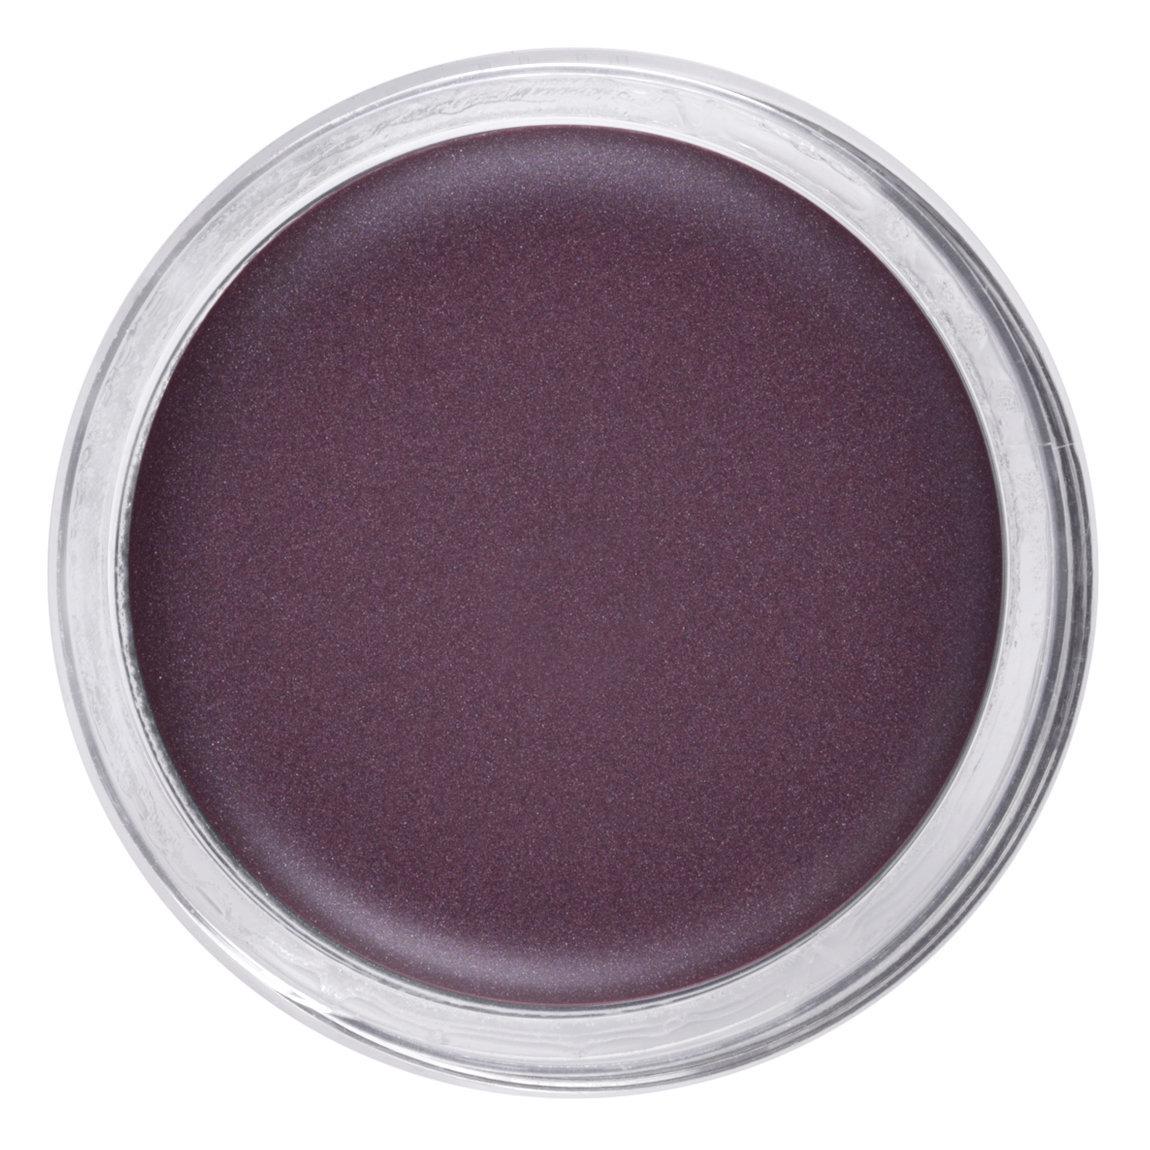 Inglot Cosmetics AMC Eyeliner Gel 100